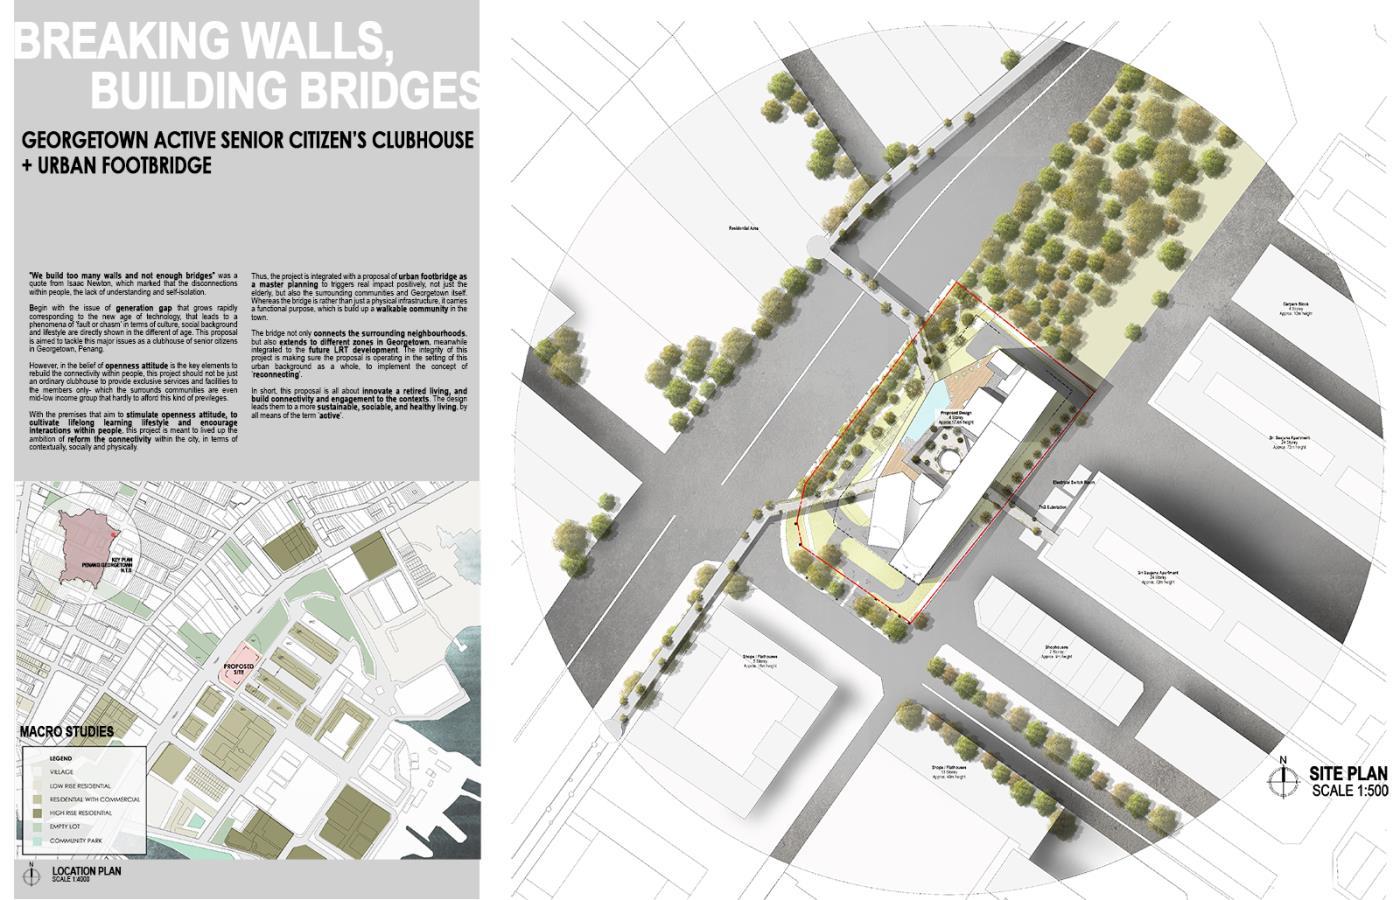 Breaking Walls, Building Bridges: Active Senior Citizen's Clubhouse + Urban Footbridge in George Town, Penang